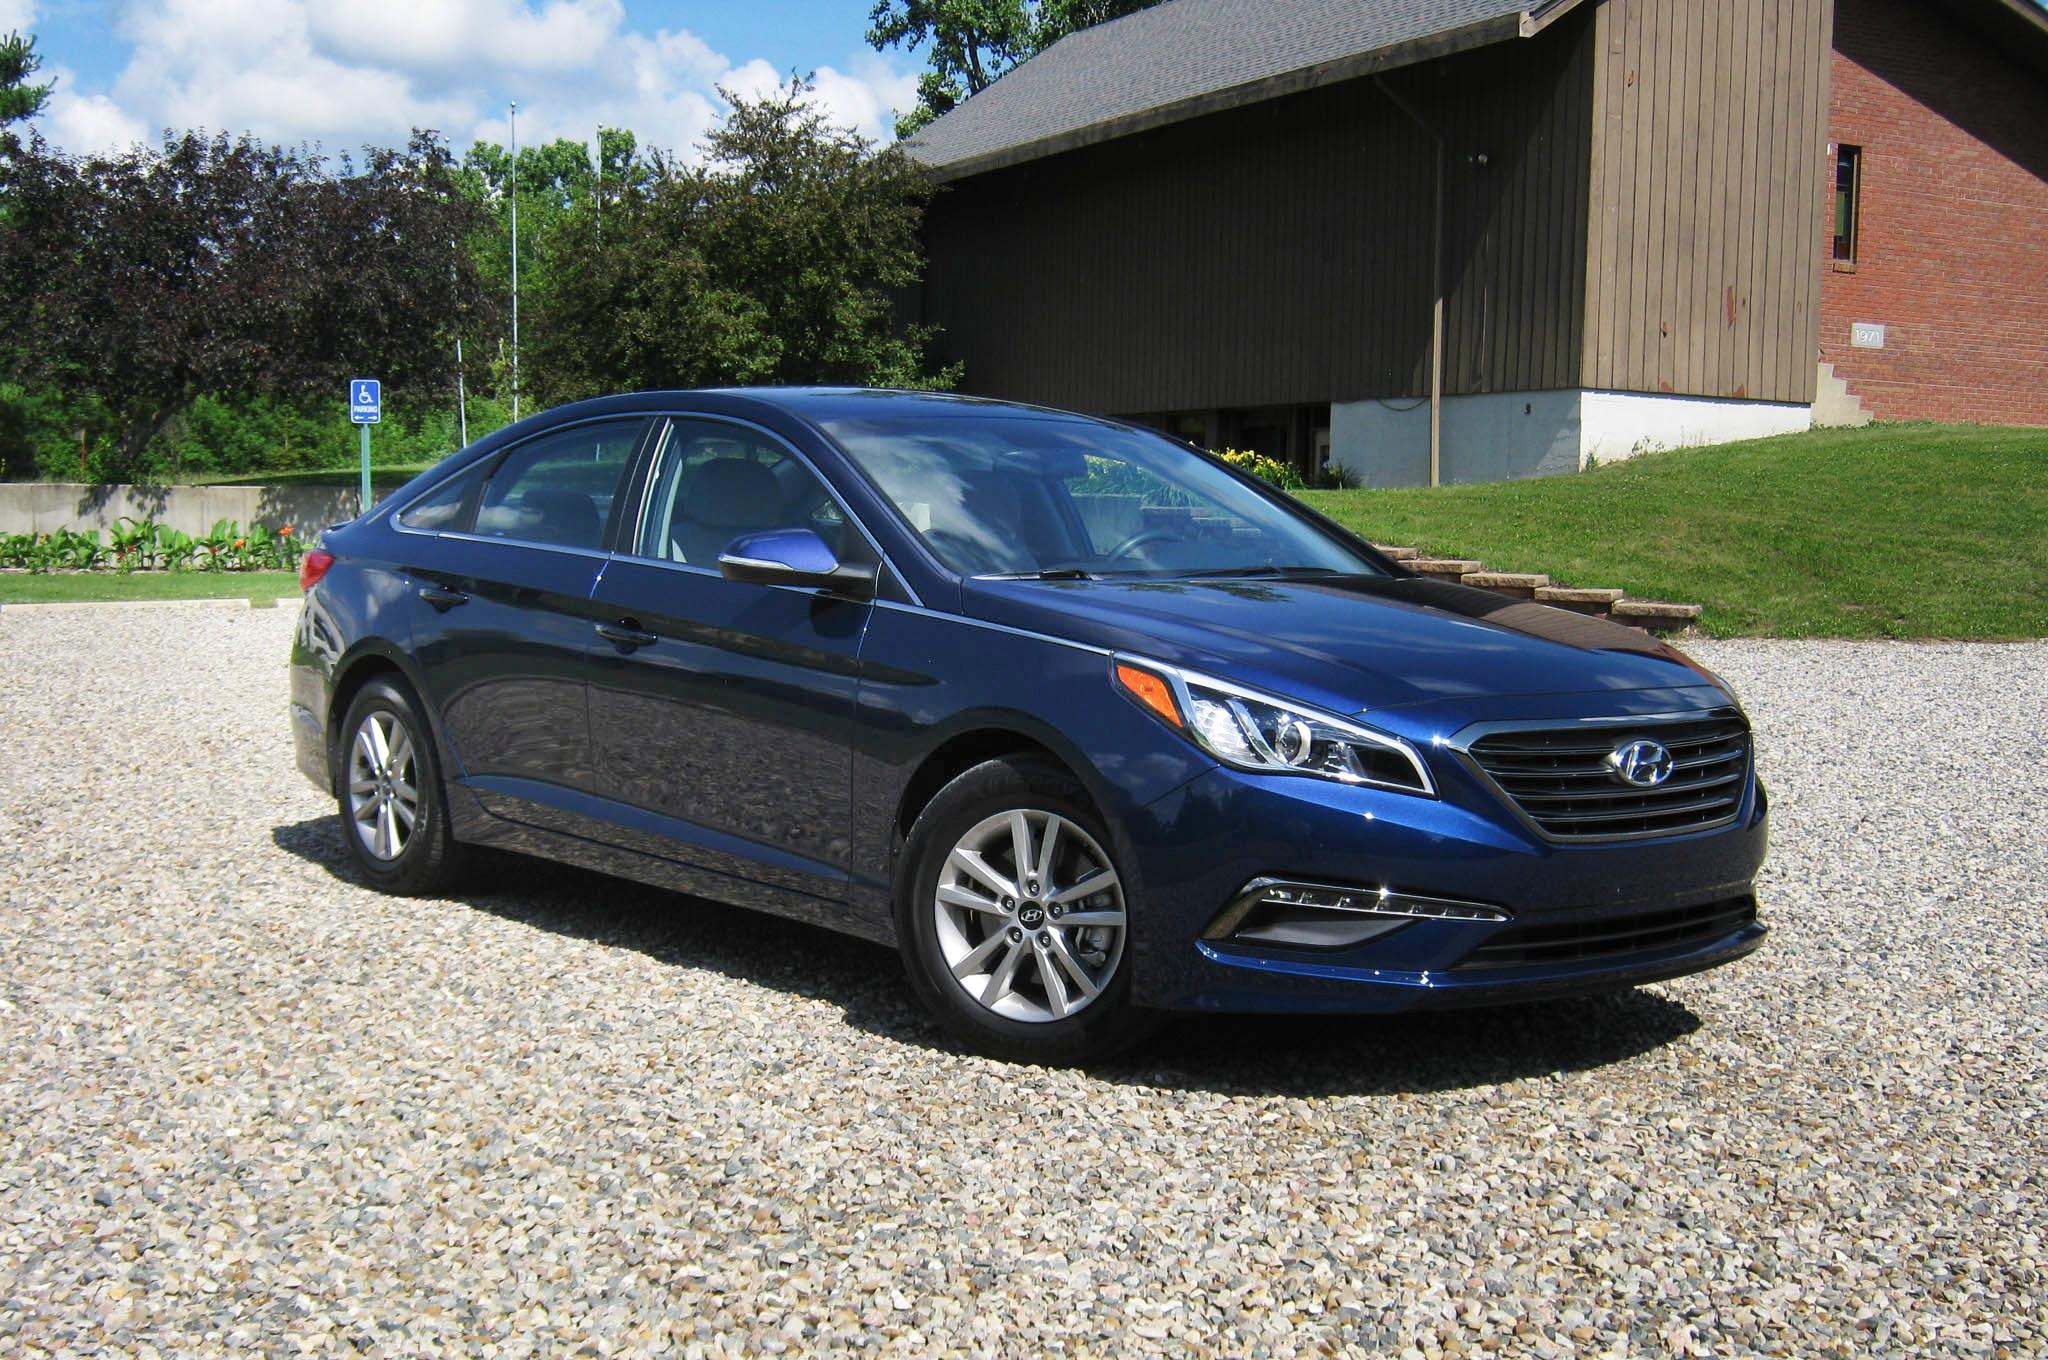 2015 Hyundai Sonata Eco Front Three Quarters 04